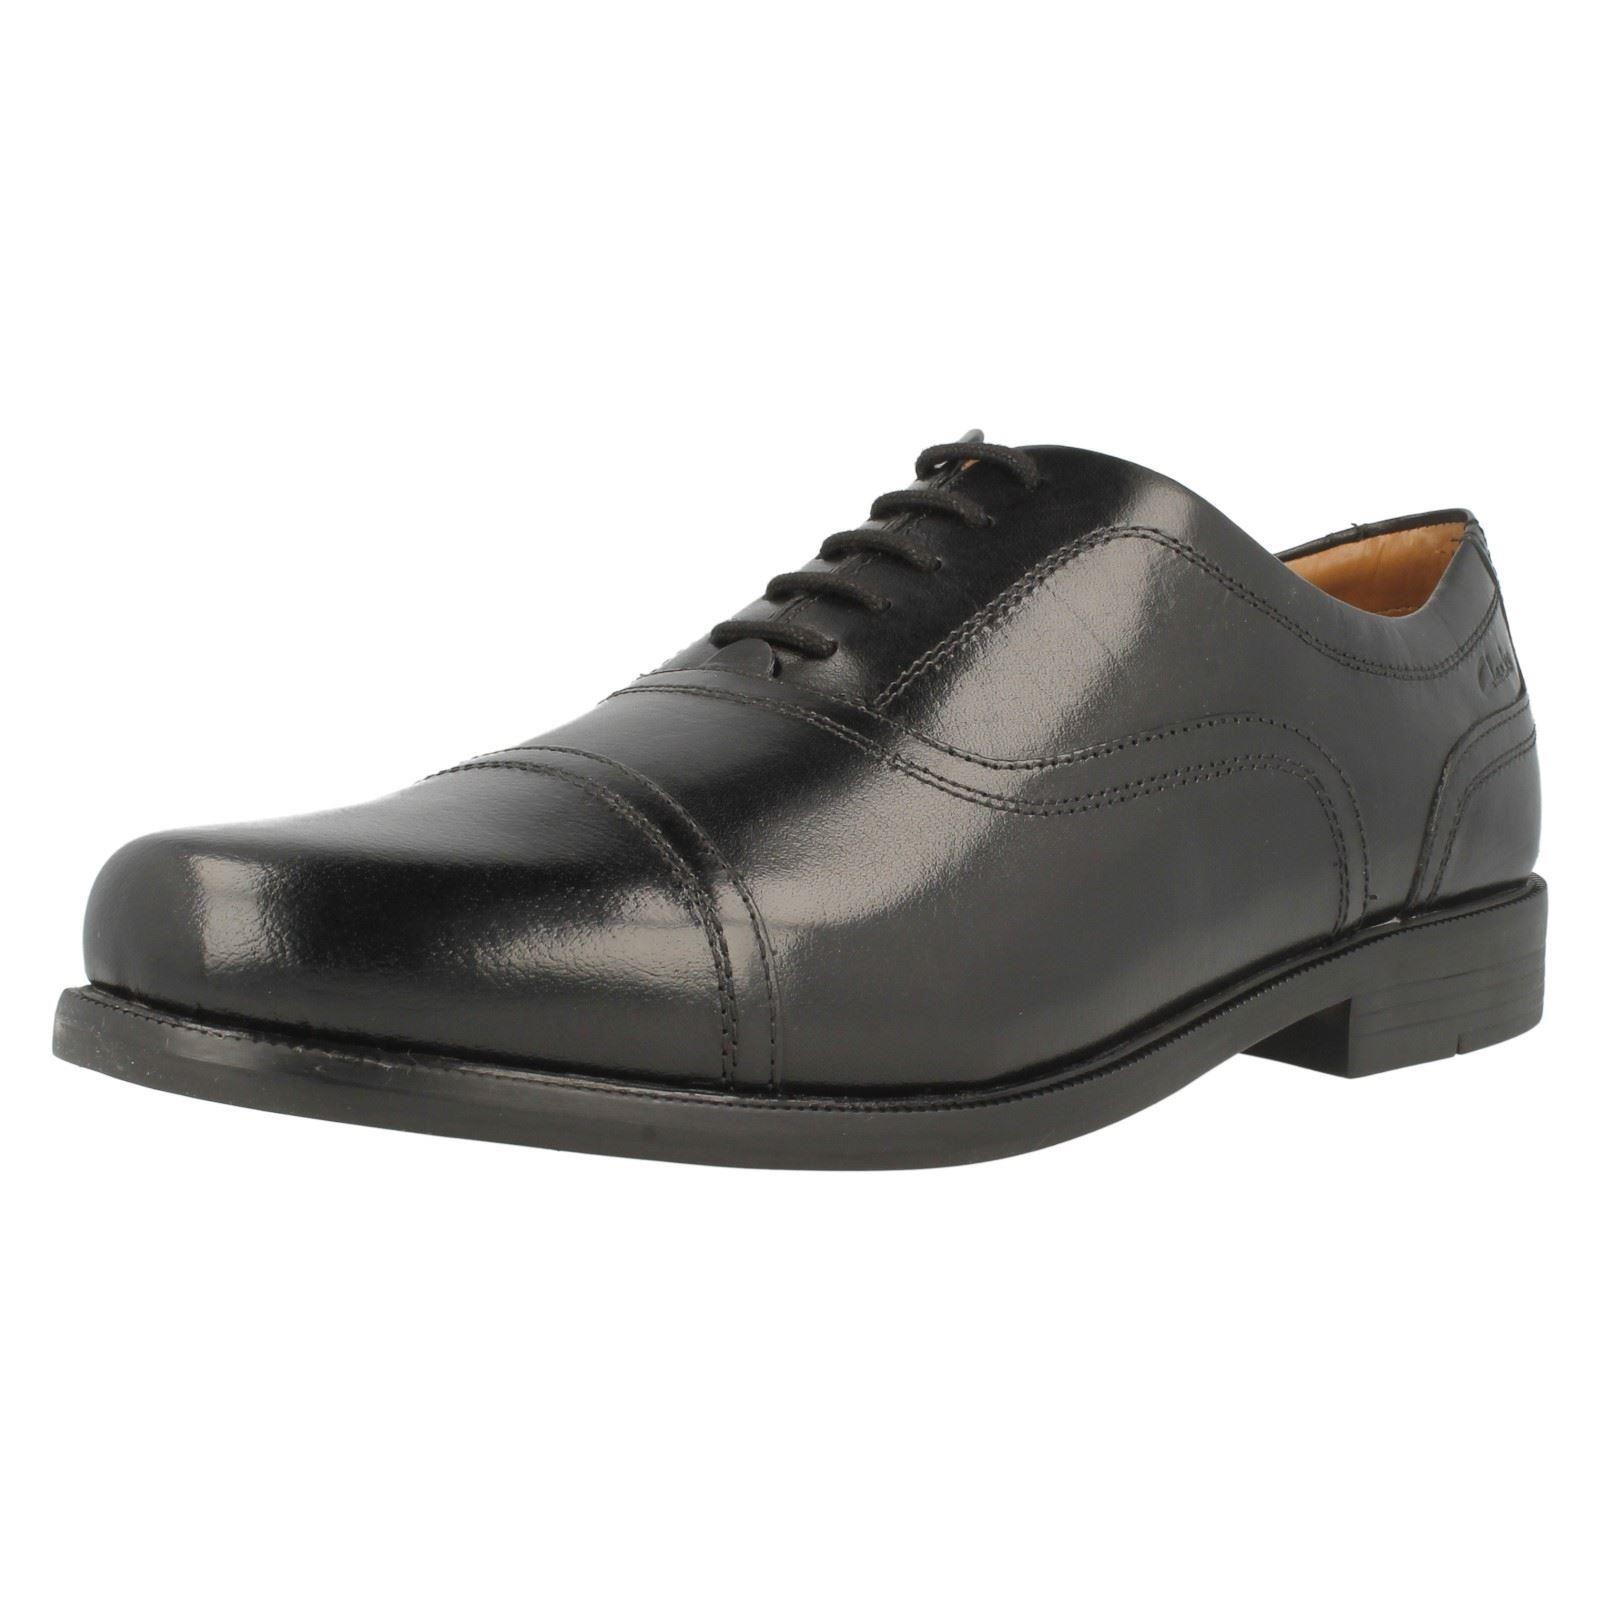 Clarks Mens Slip On Formal Shoes Beeston Cap